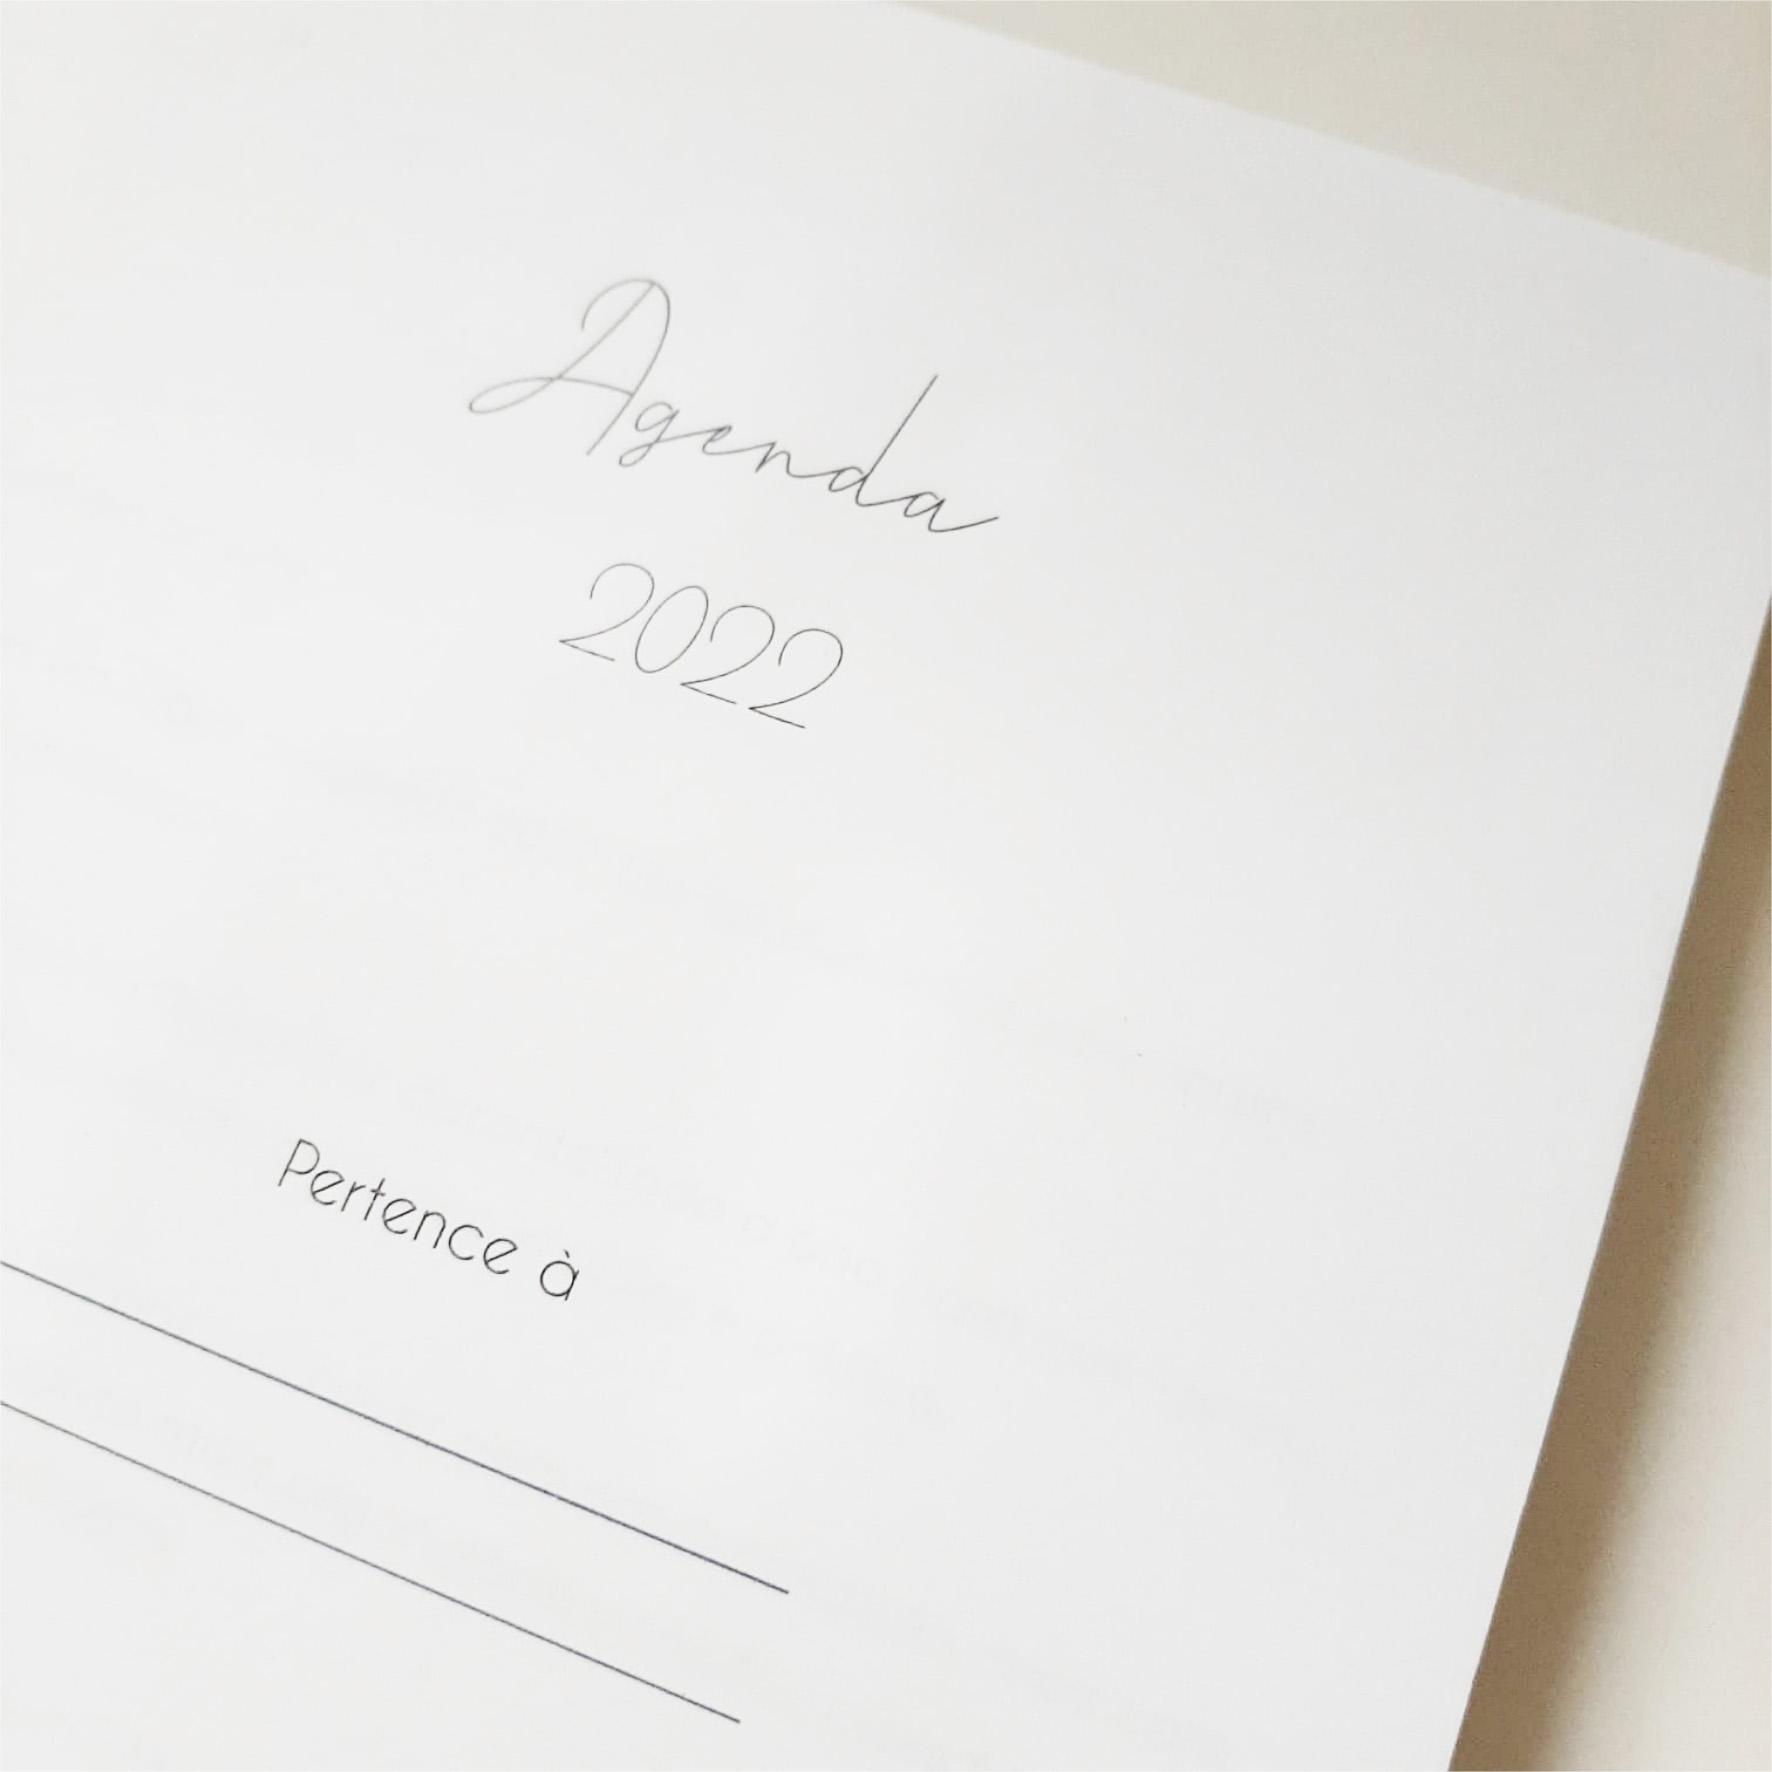 Agenda 2022 - Sonhar